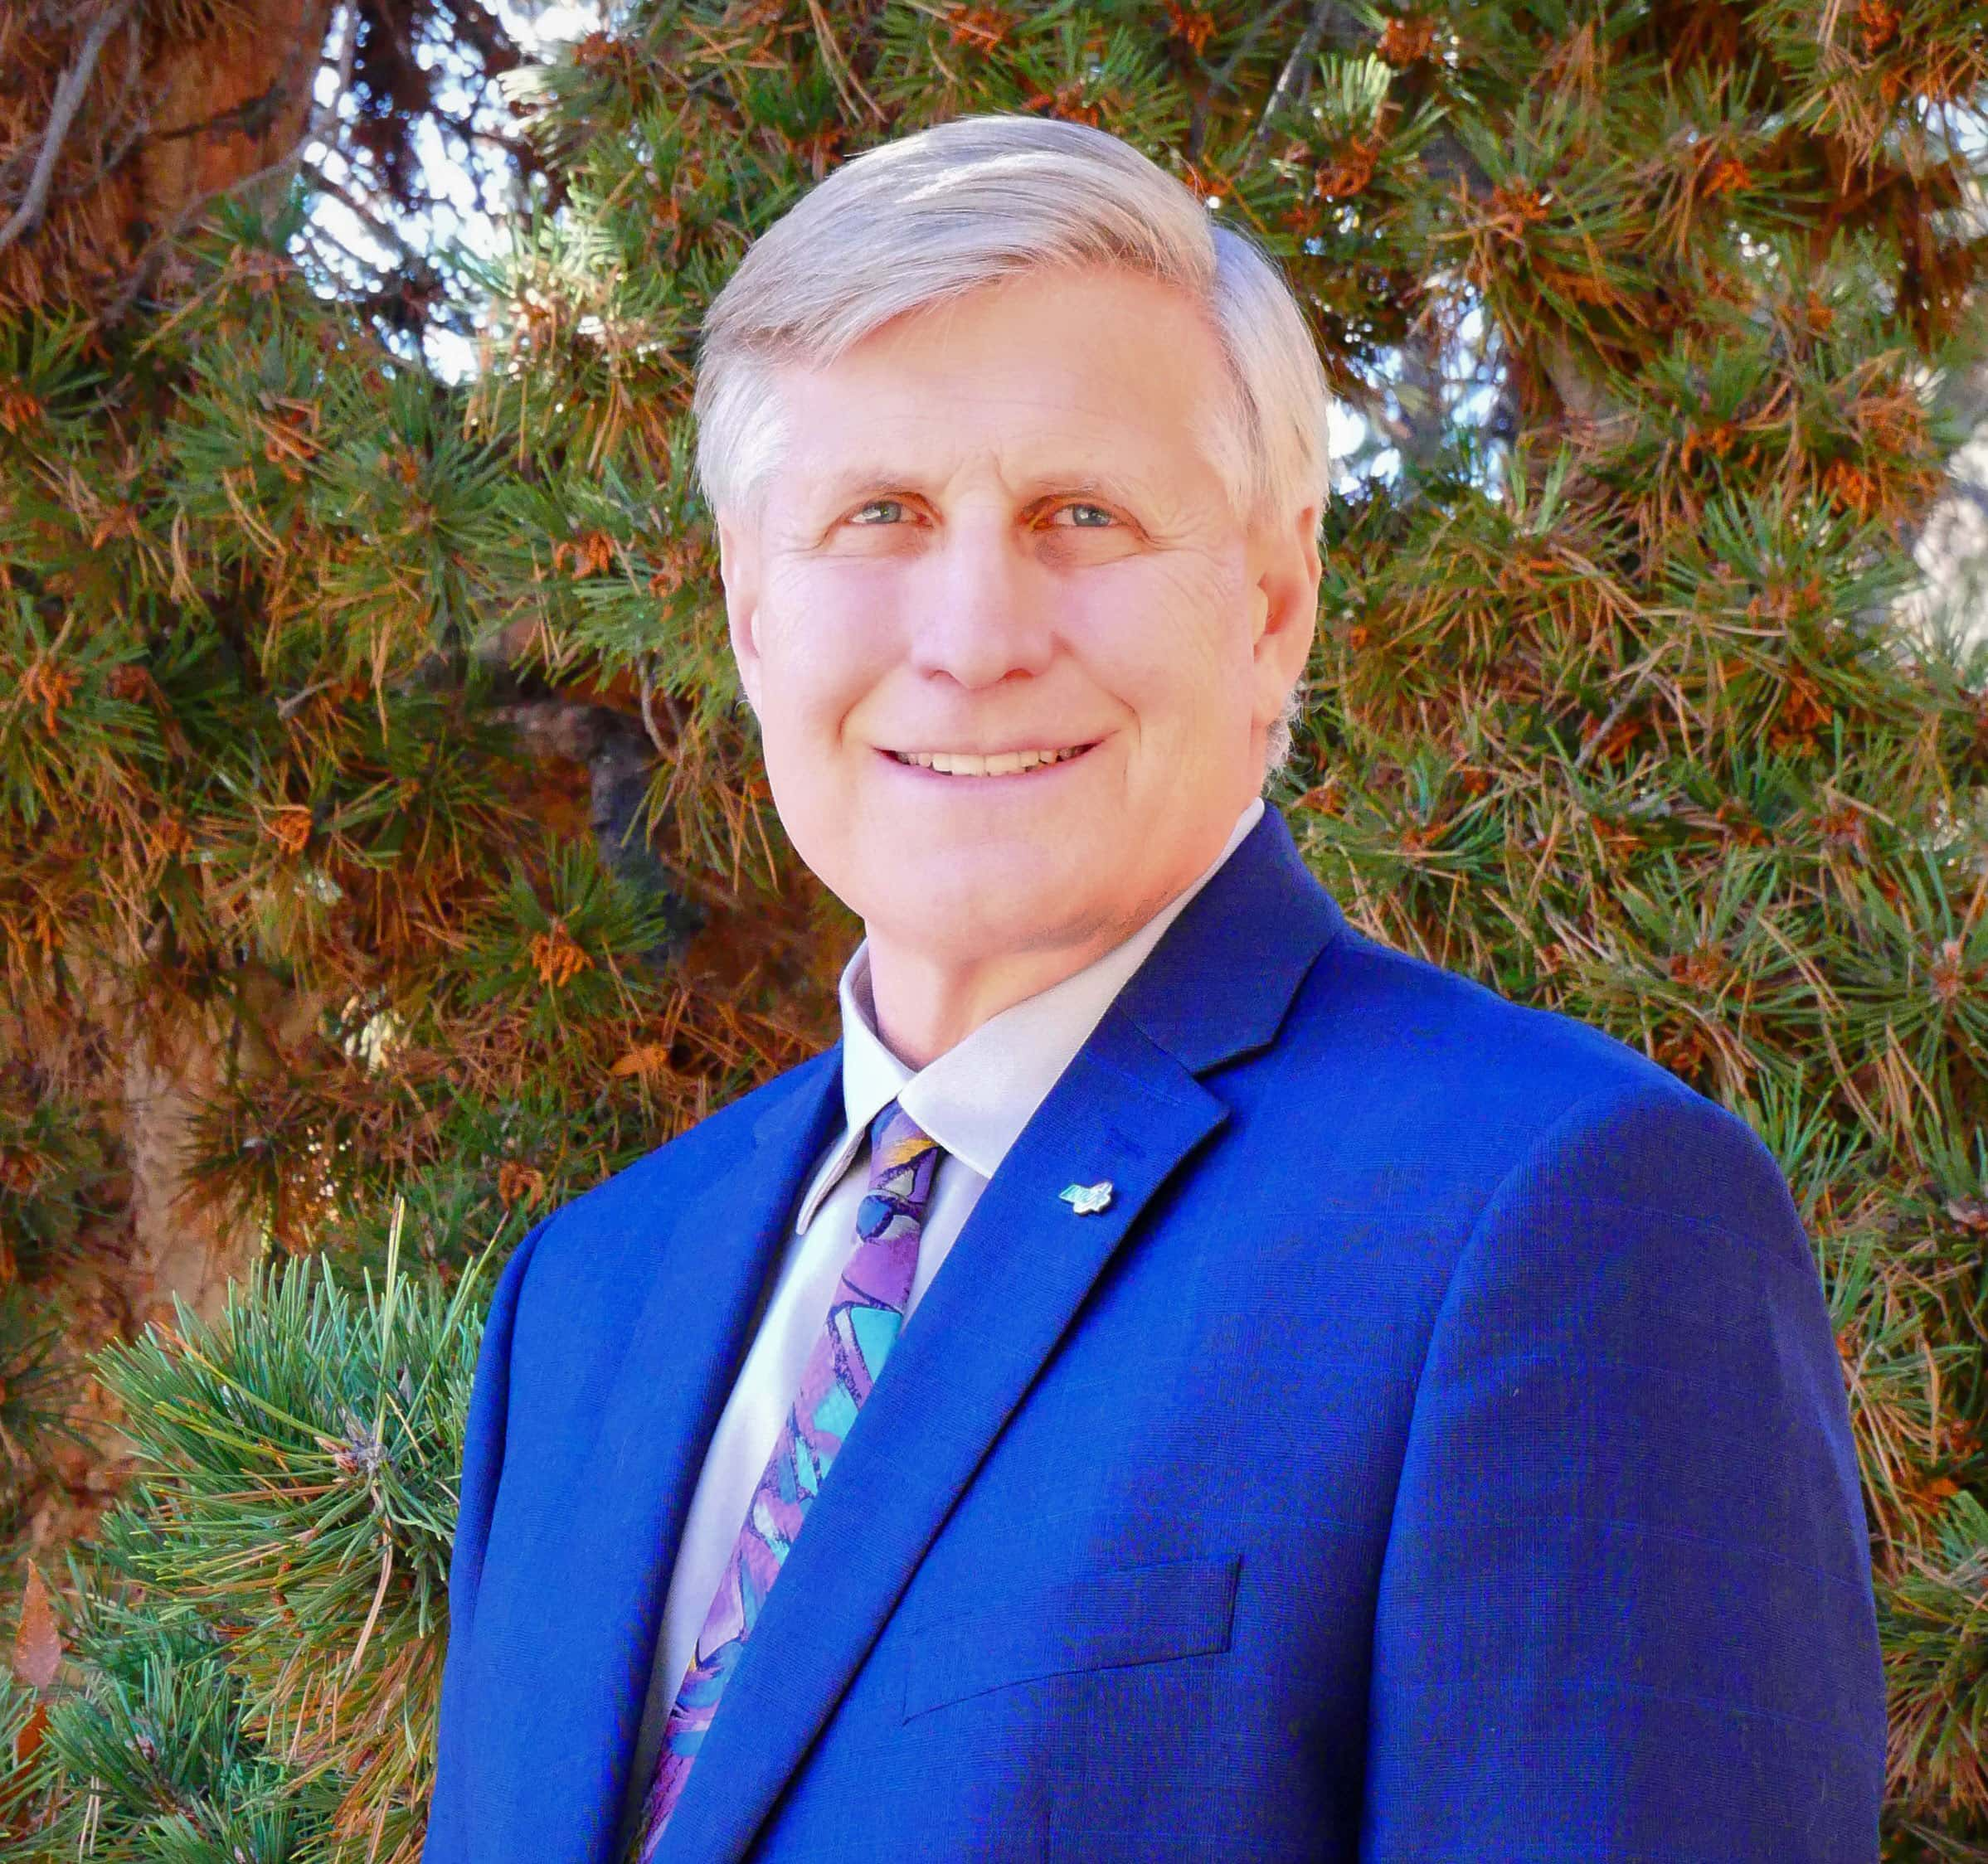 Dr. Shawn Powell